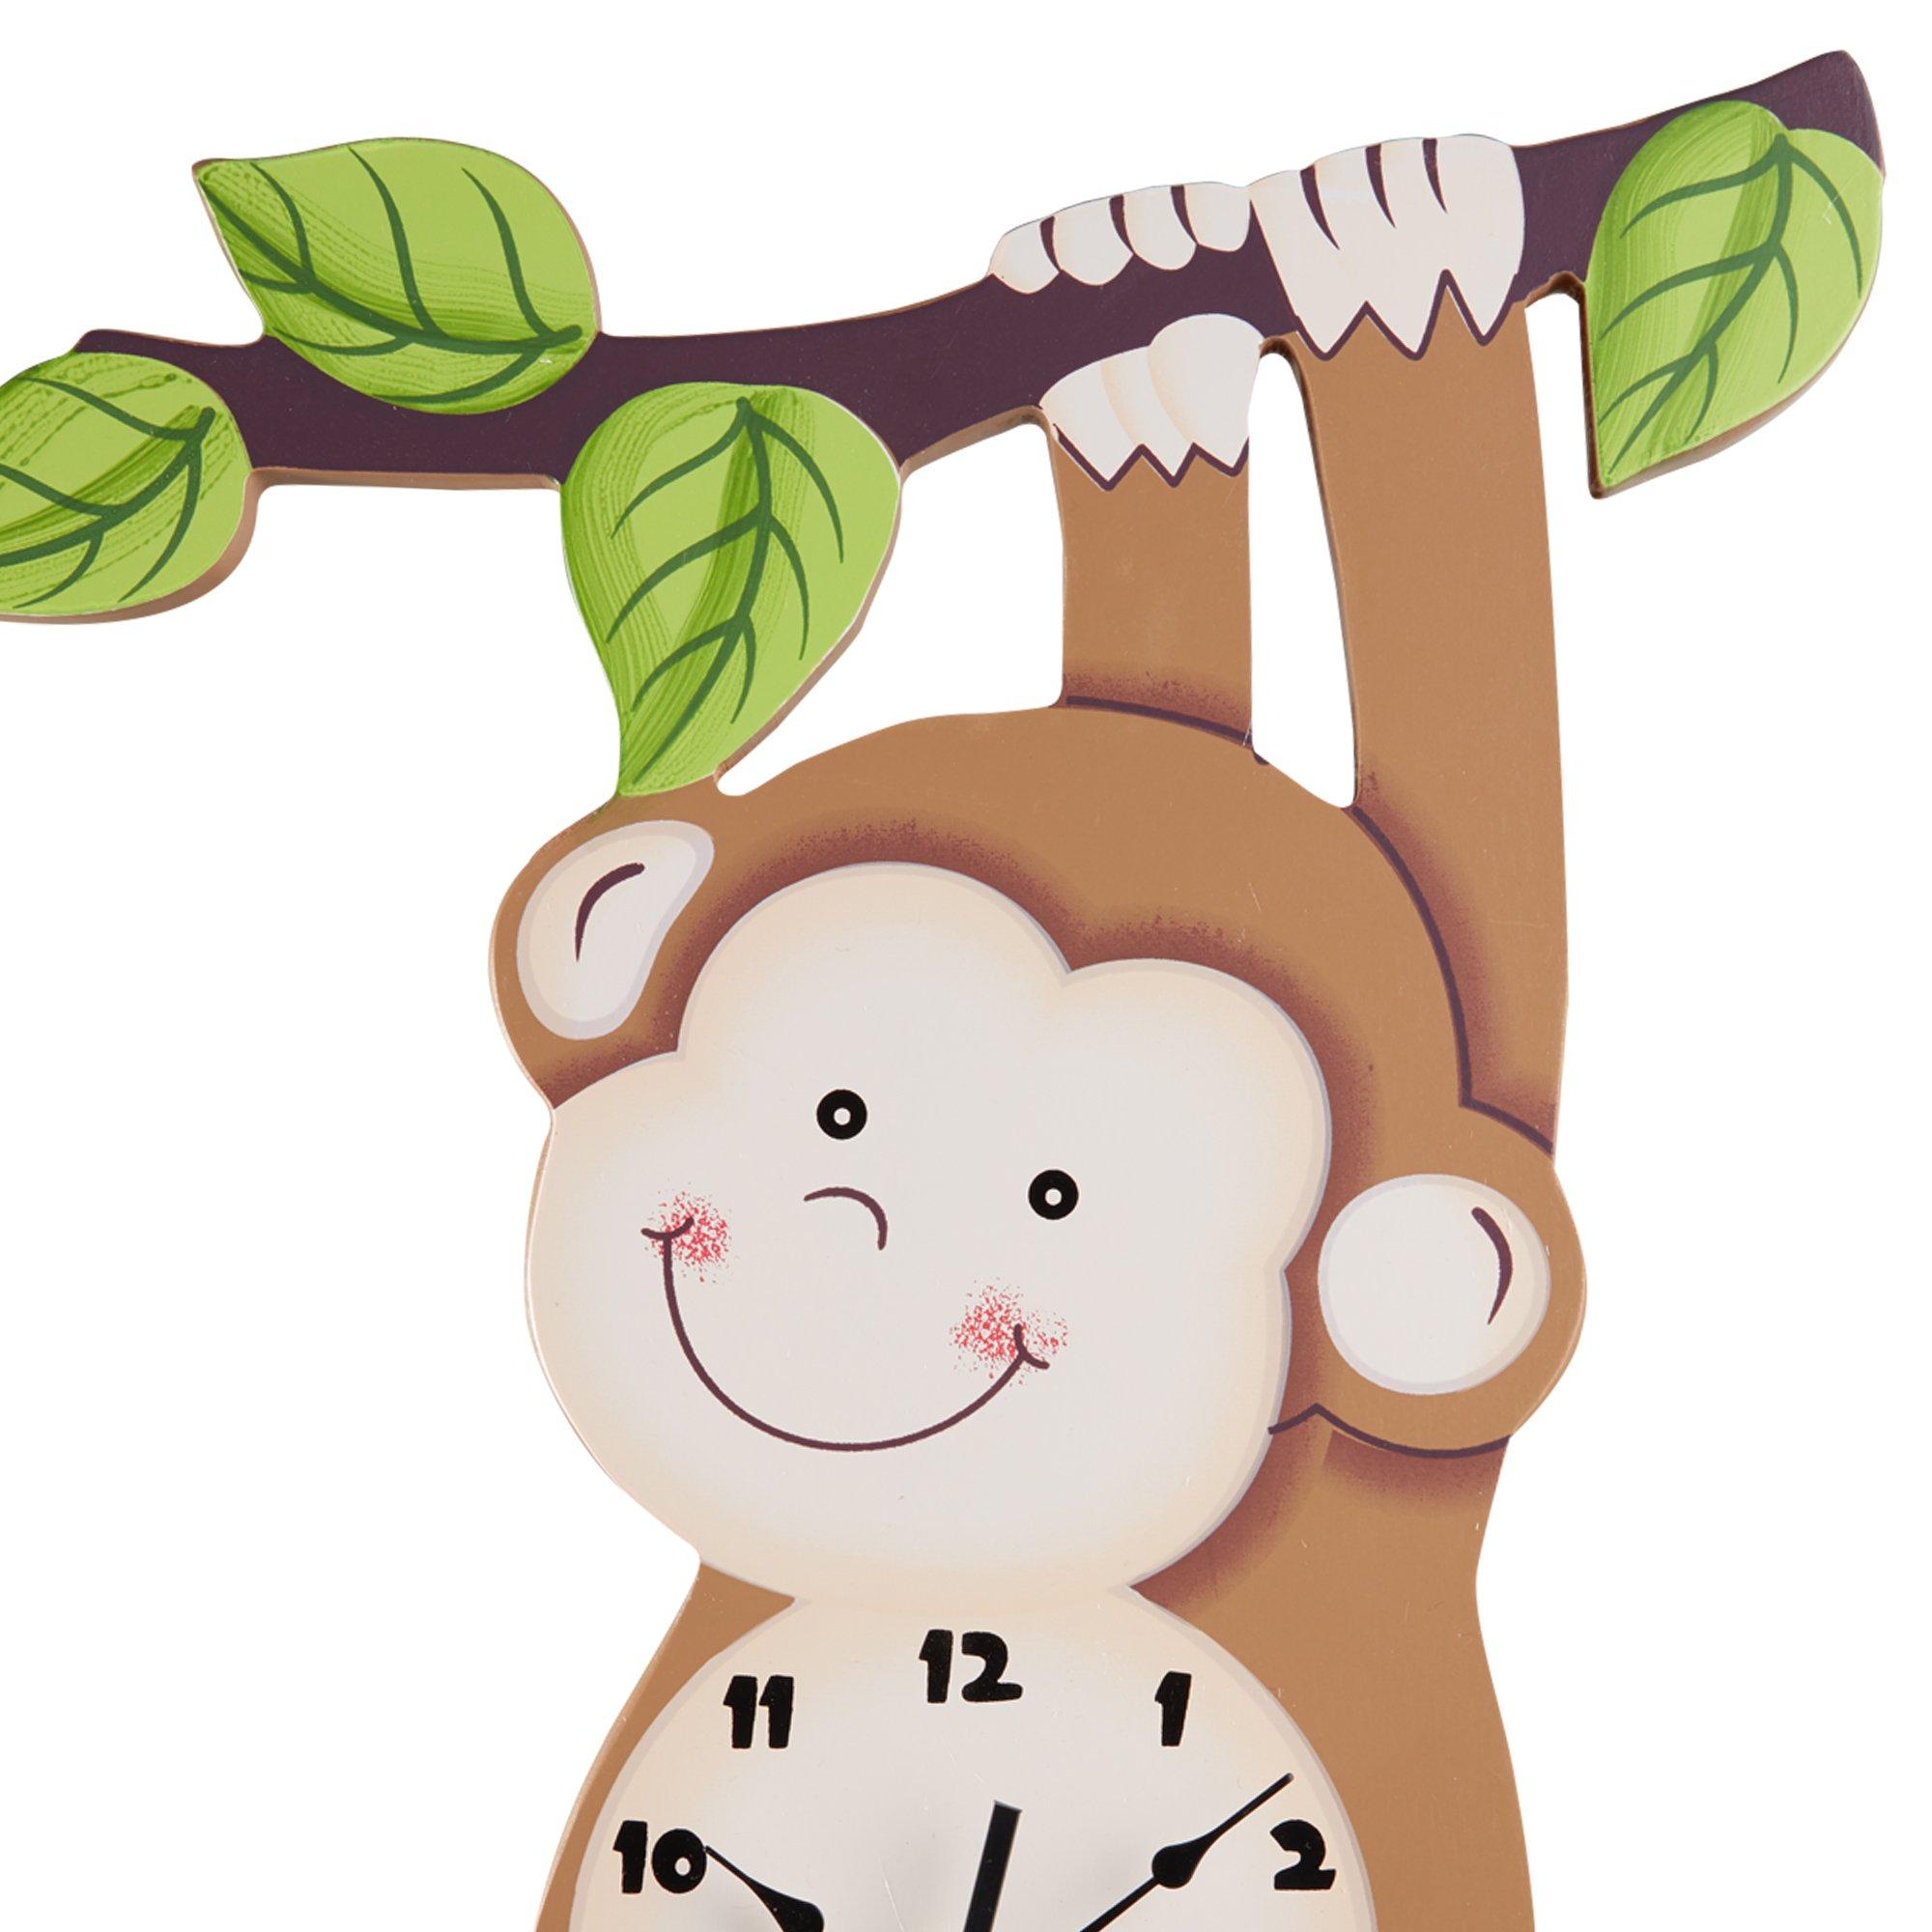 Fantasy Fields Sunny Safari Kids Wall Clock, Brown/Monkey by Fantasy Fields (Image #4)